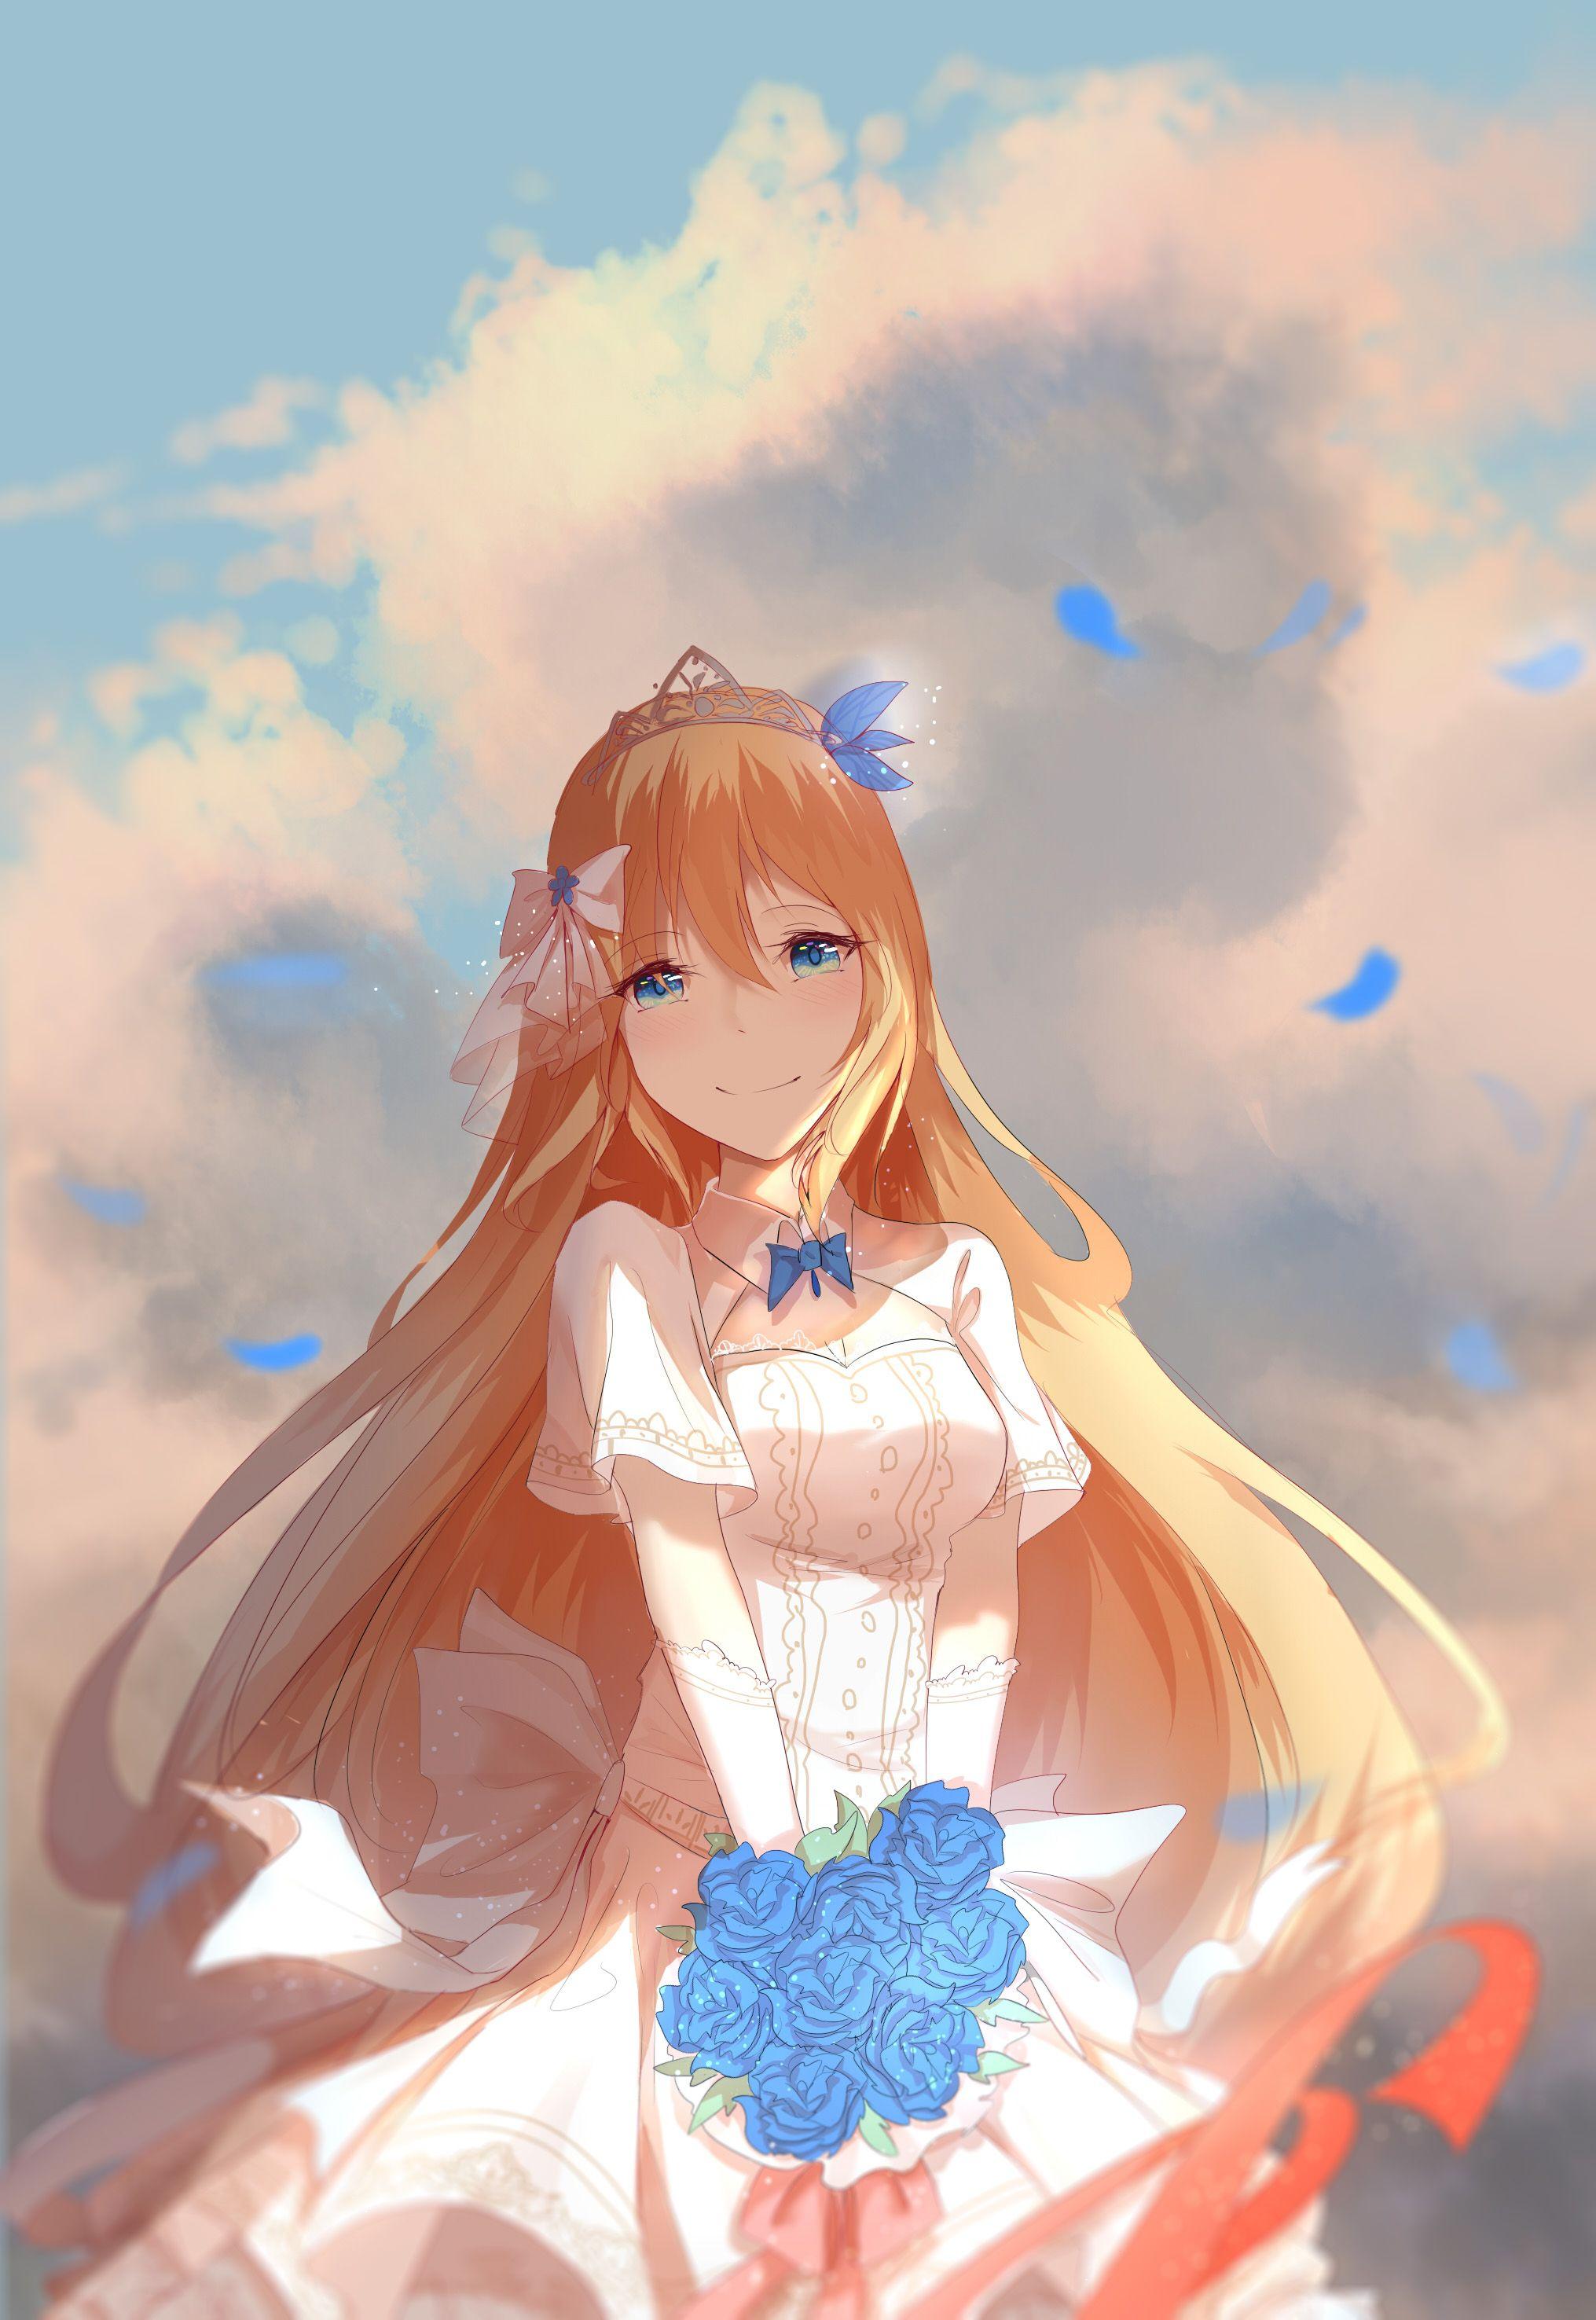 Anime girl - wedding dress | Manga - Anime | Pinterest